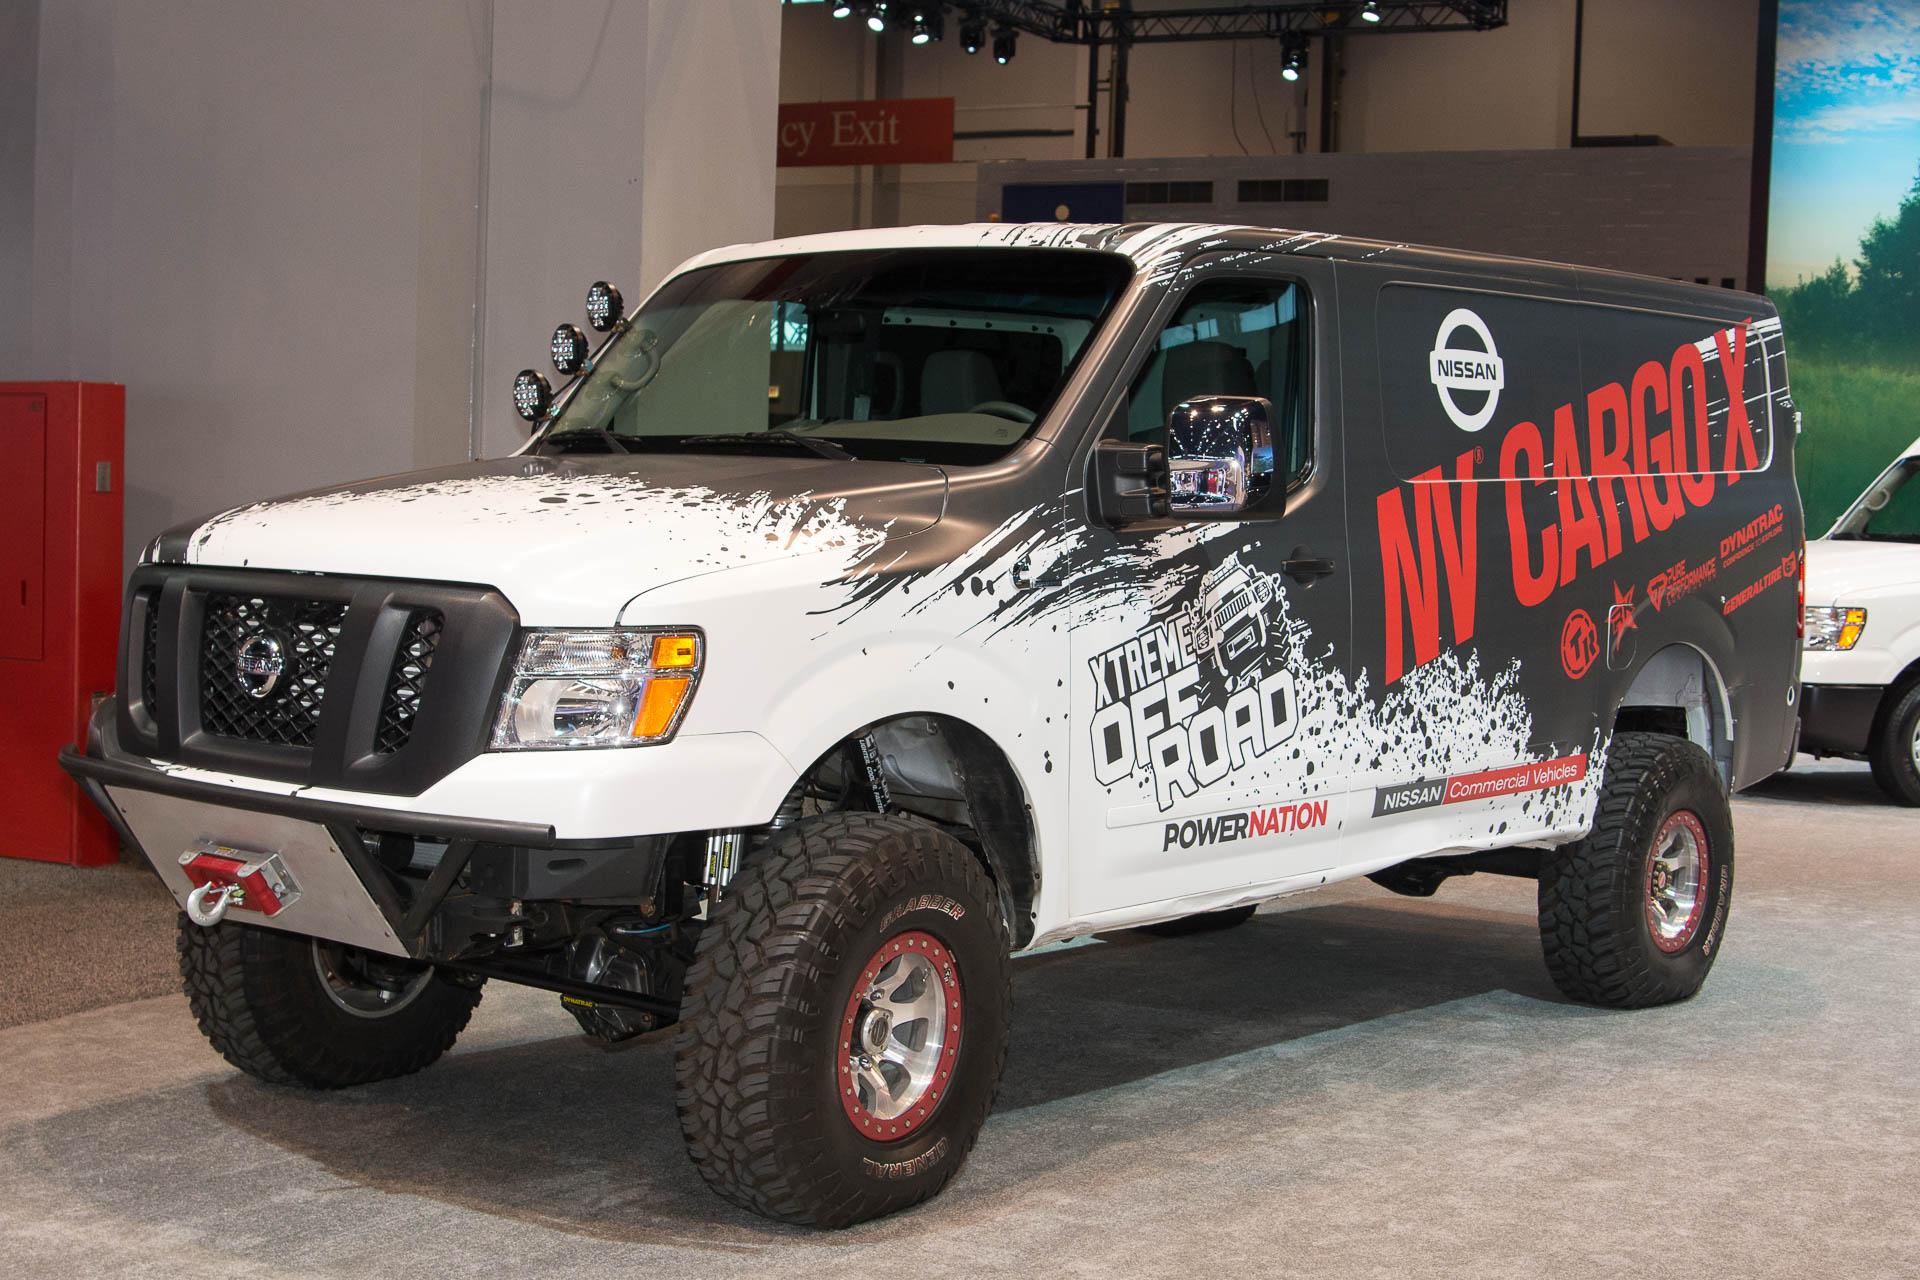 Nissan created an NV cargo van you actually want